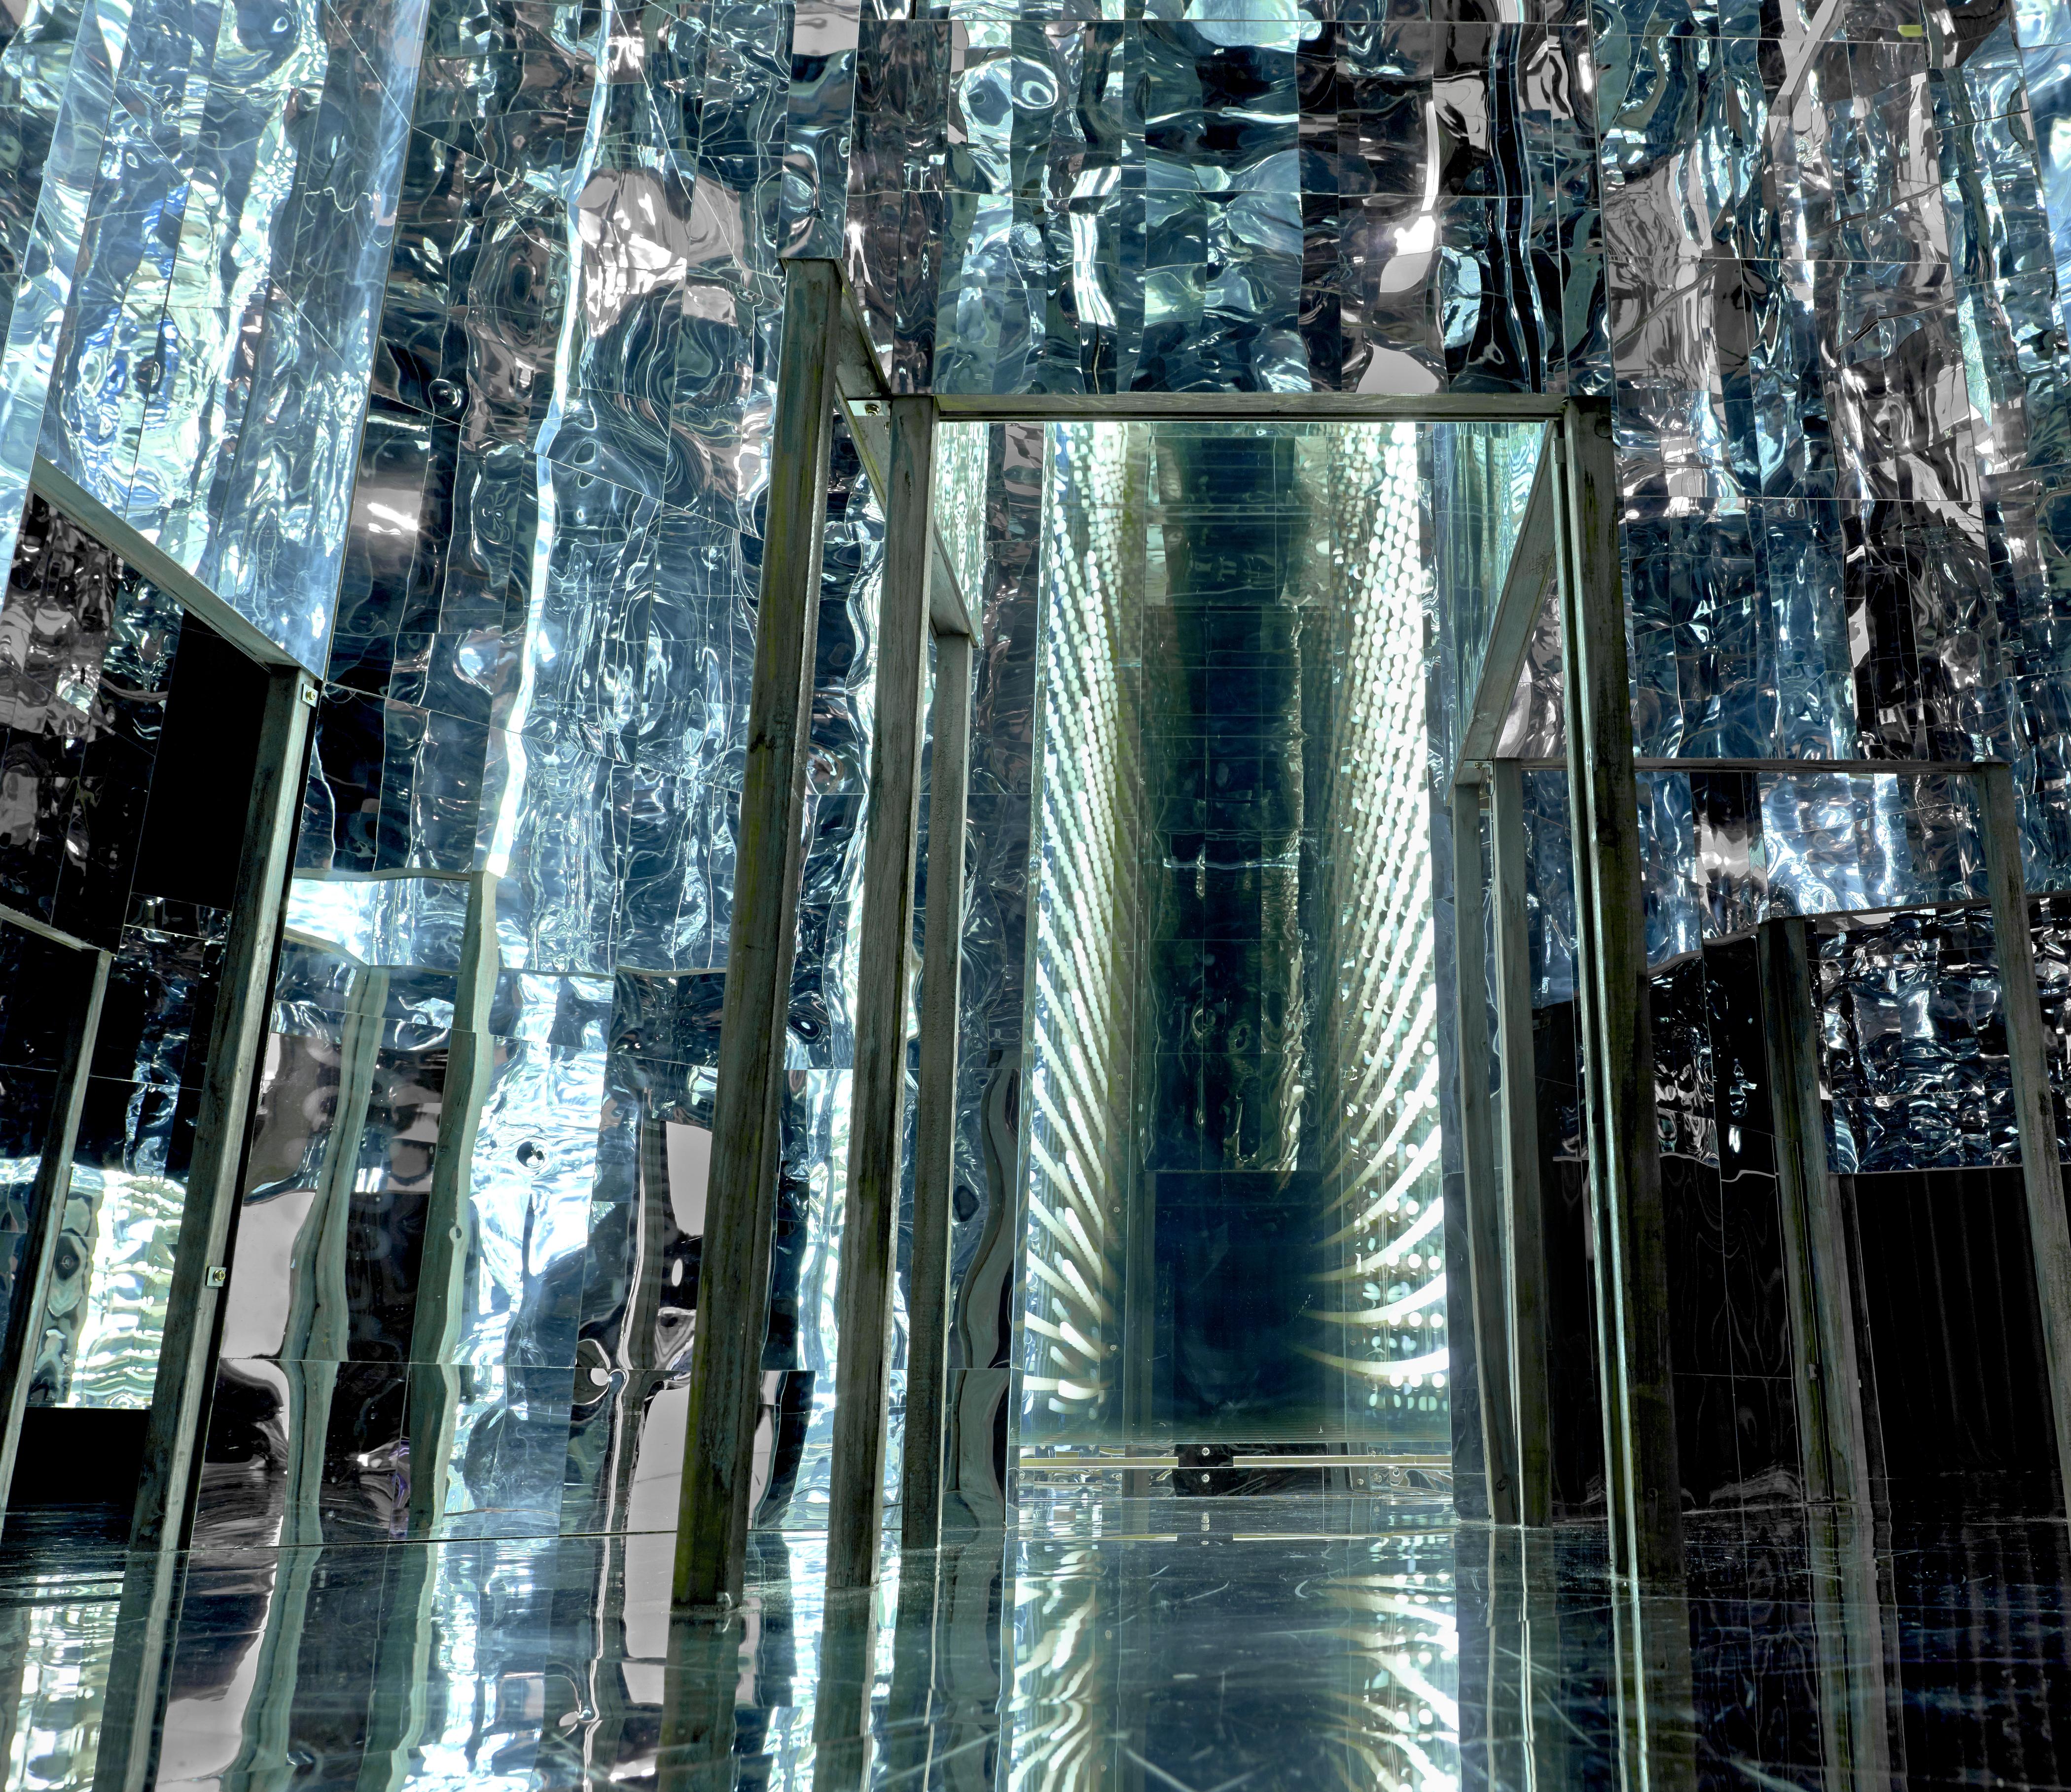 Lee bul 39 s labyrinth of infinity mirrors via negativa ii for Mirror installation